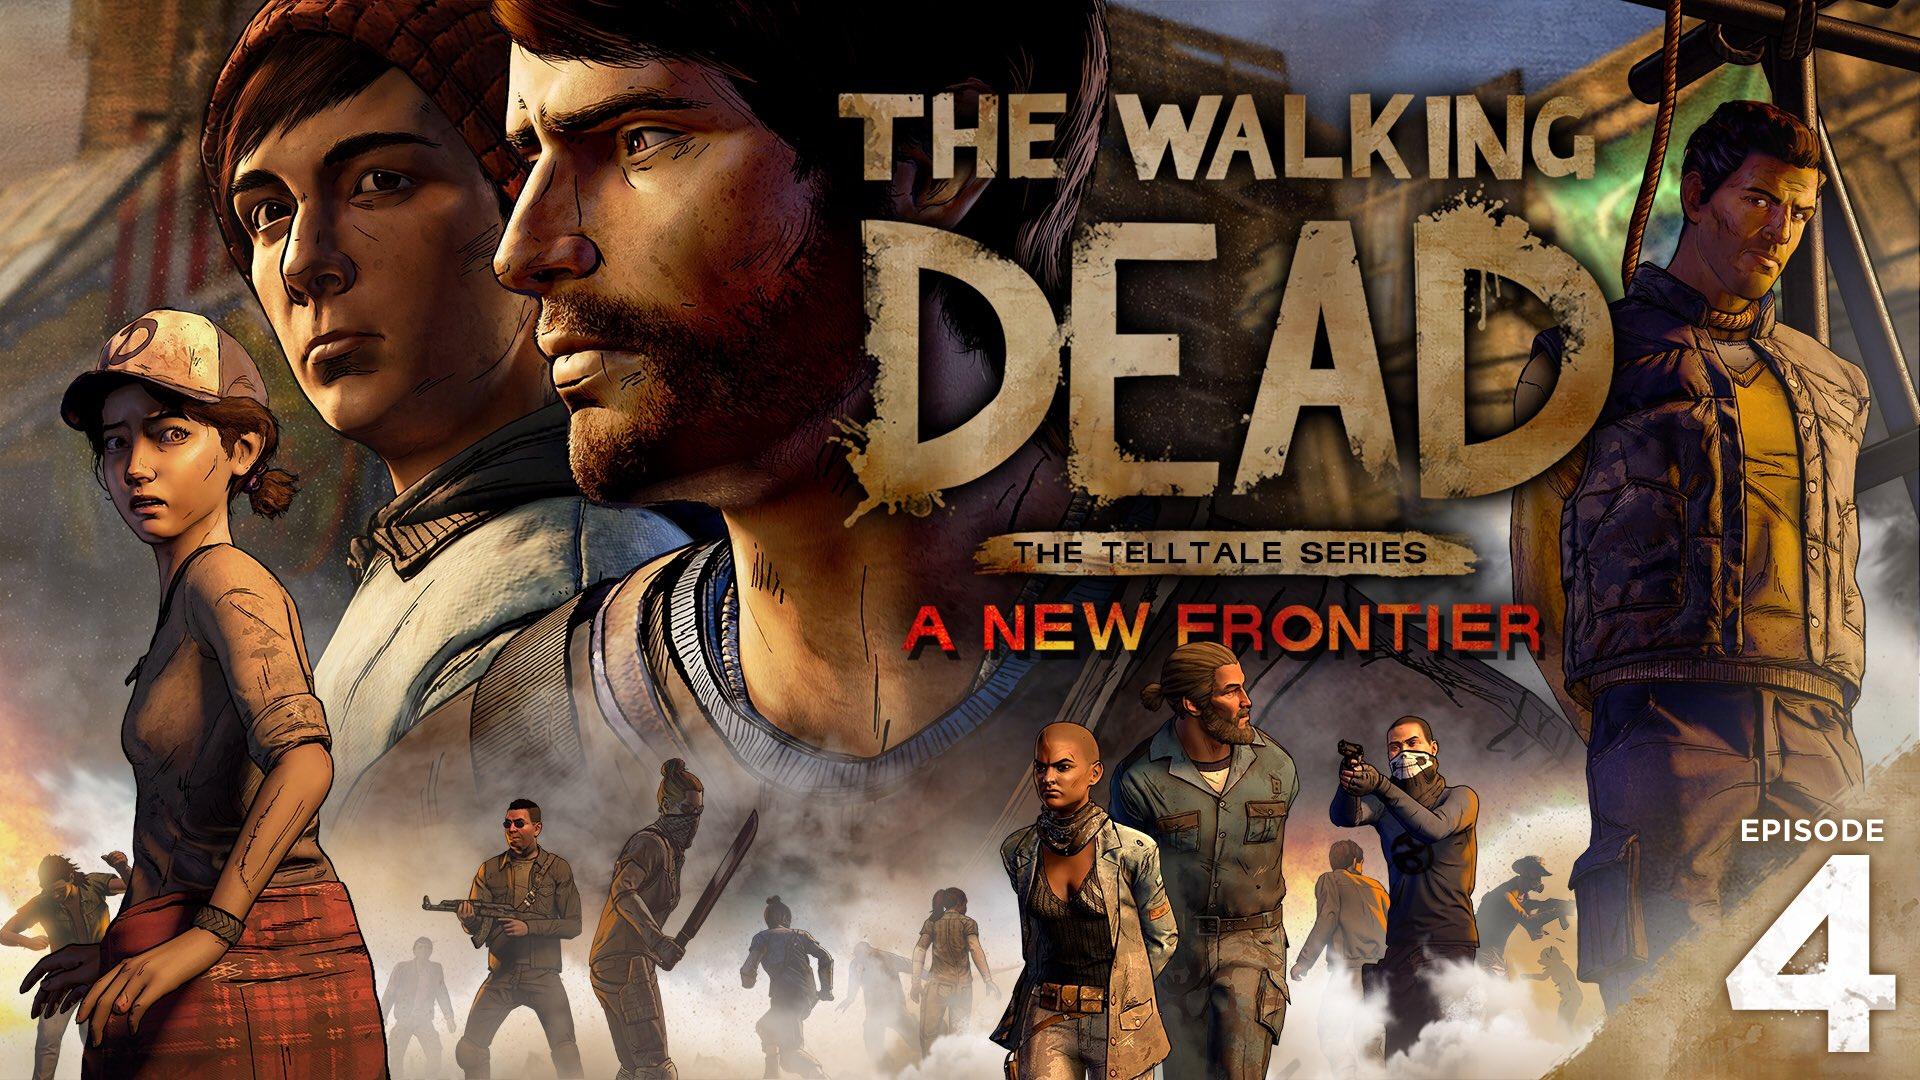 Čtvrtá epizoda The Walking Dead: A New Frontier dorazí 25. dubna 142412